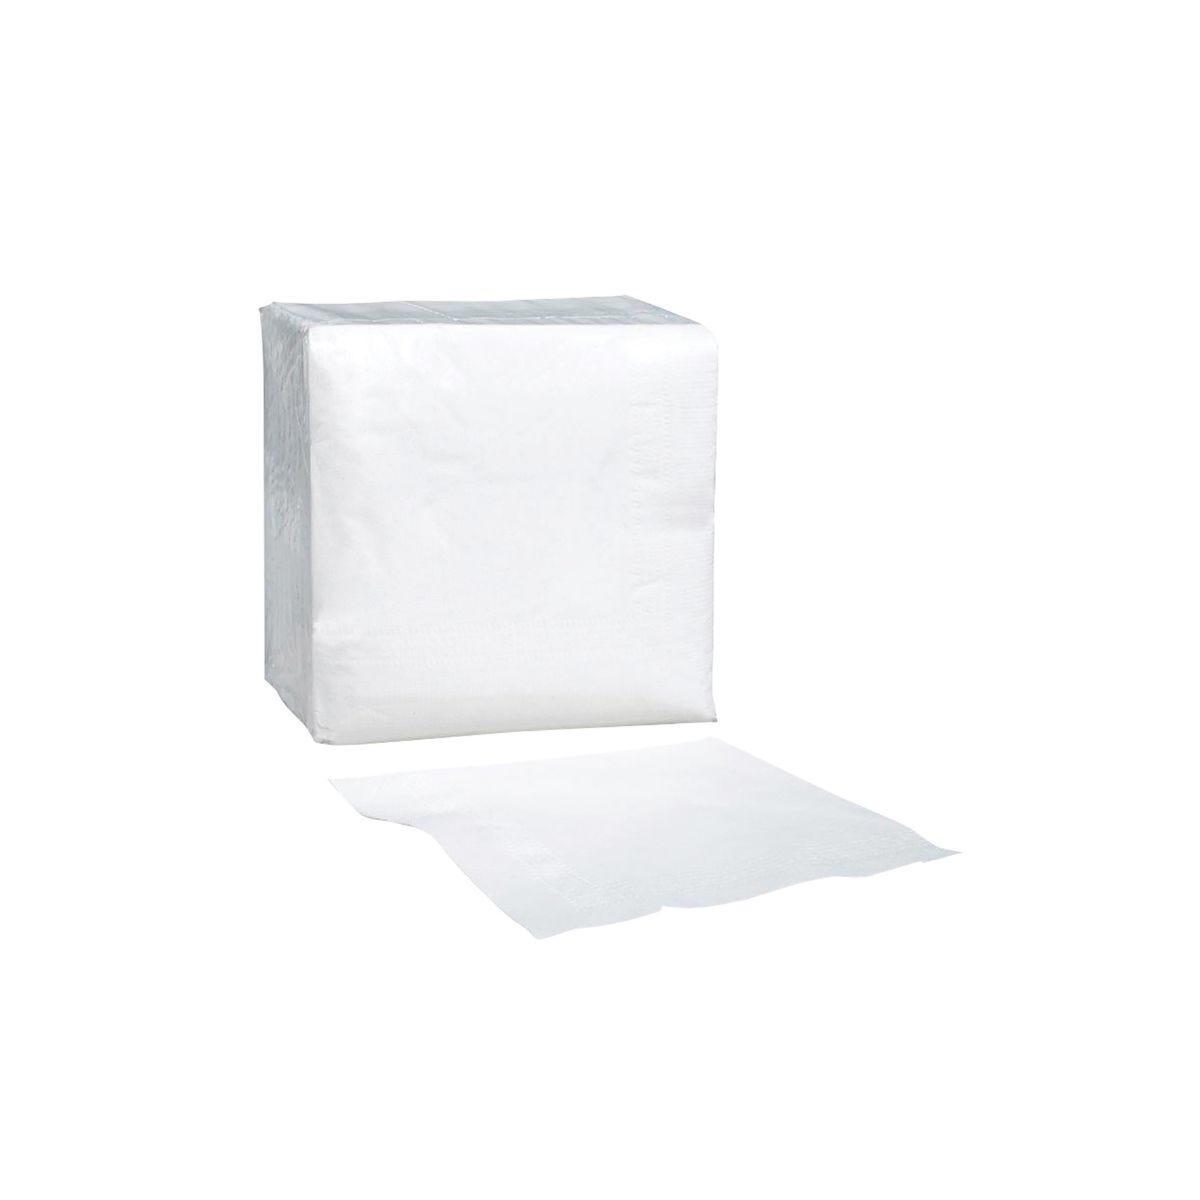 Paper Napkins 32 x 30cm 1-Ply Pack of 500 White